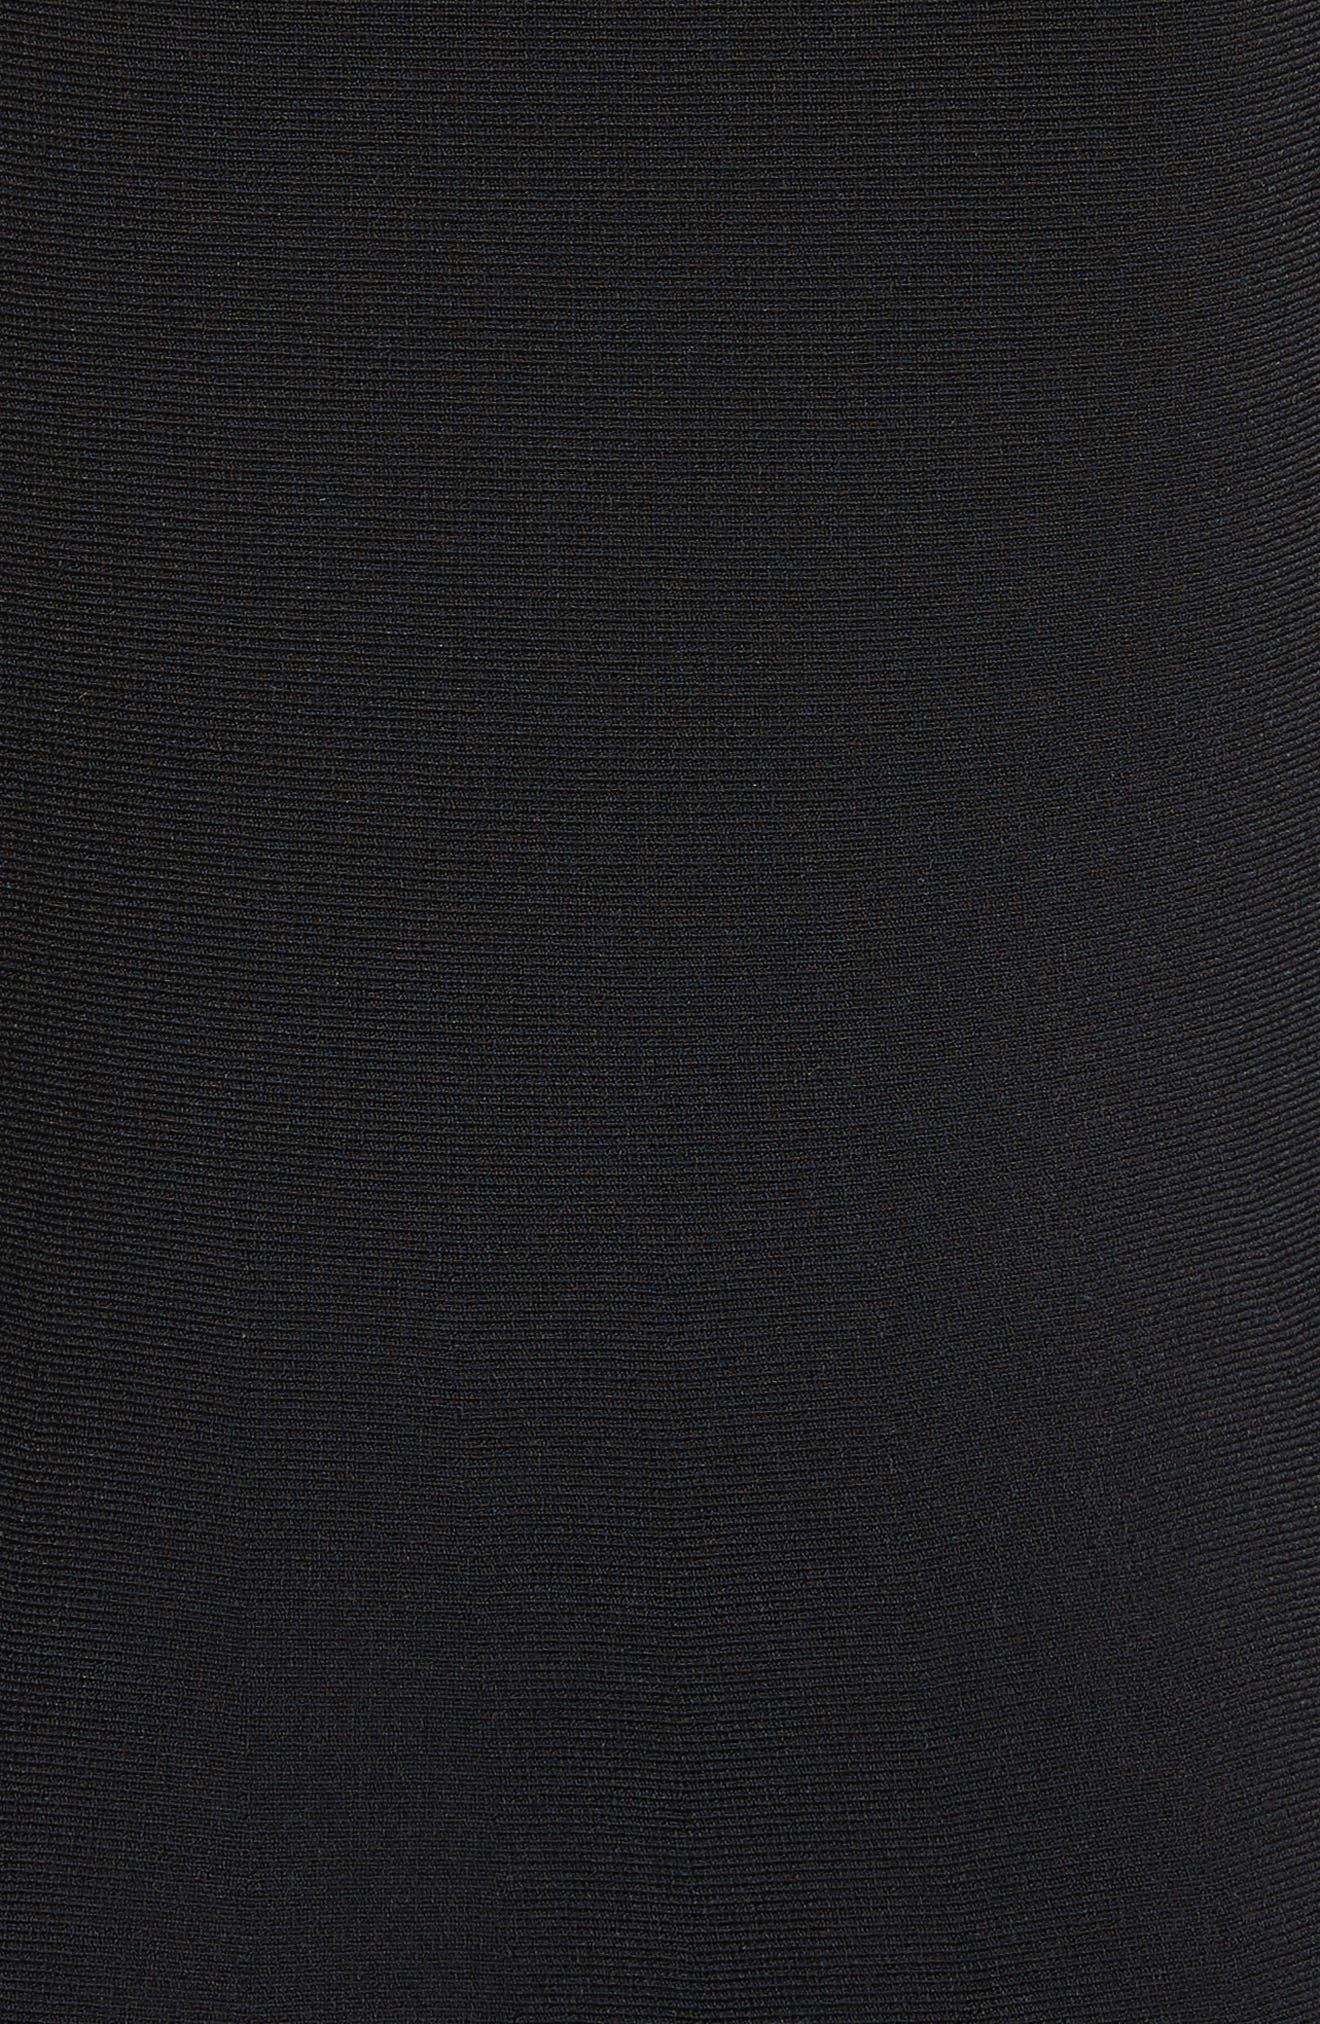 Ruffle Neckline Knit Dress,                             Alternate thumbnail 6, color,                             Black/ Ivory